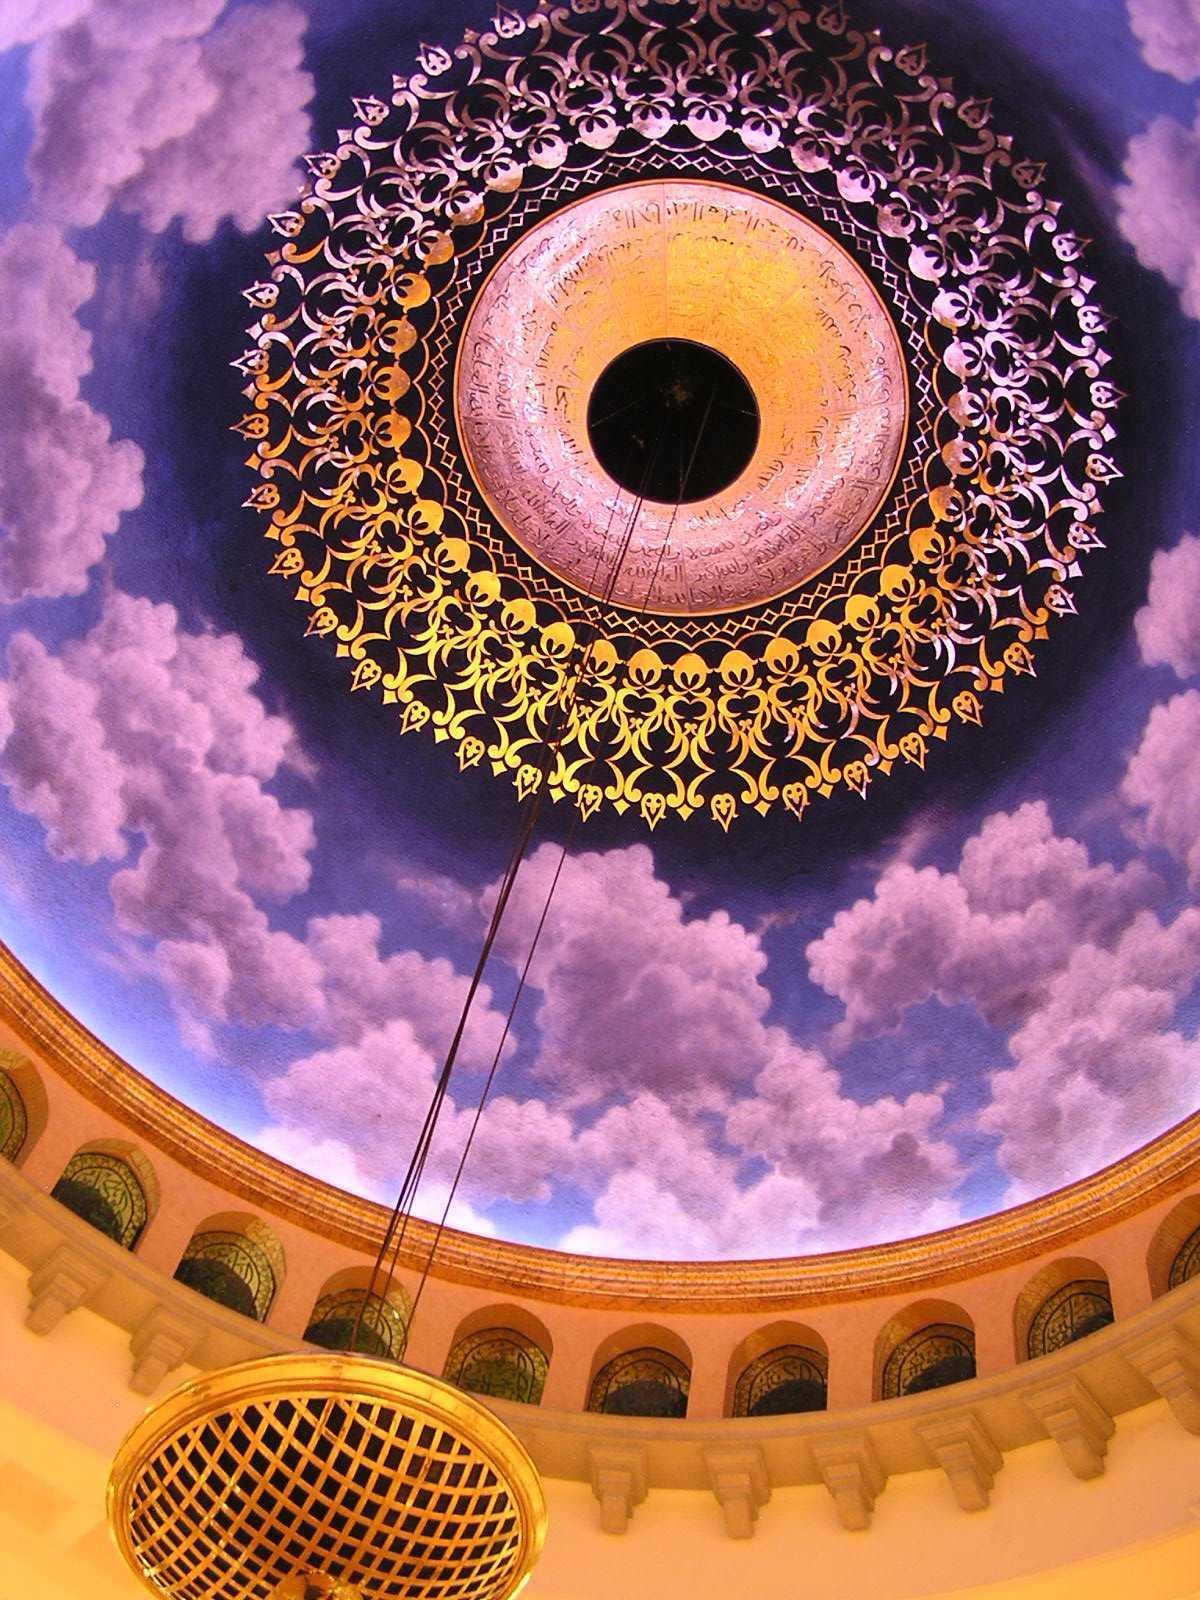 Pt. Garisprada Kubah Emas Mosque Meruyung, Limo, Depok City, West Java, Indonesia Depok Ceiling Klasik  22023